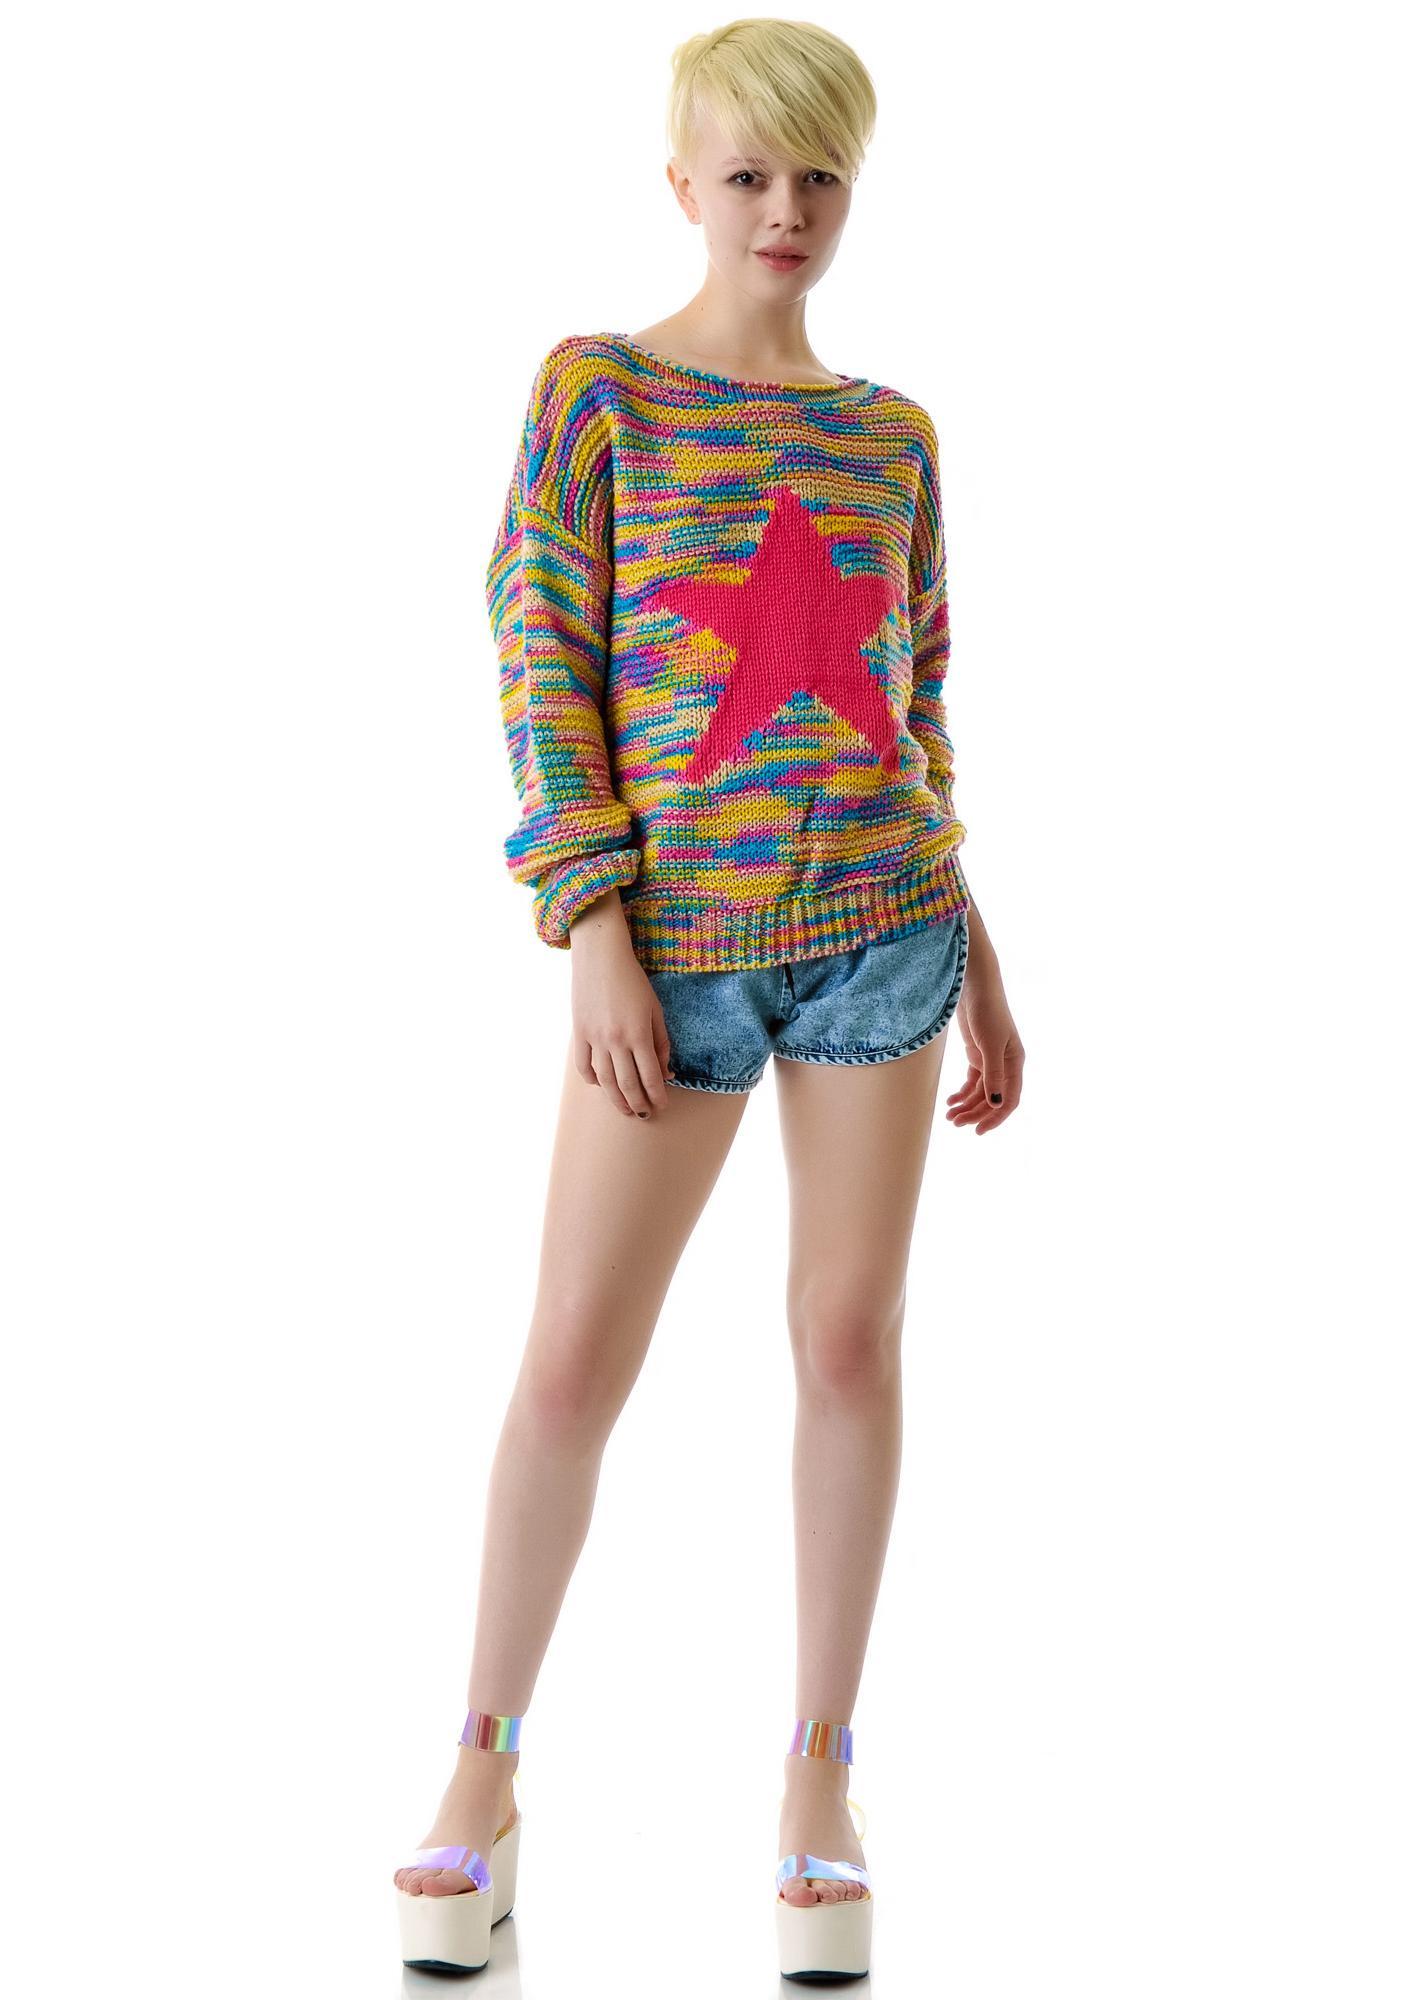 Starstruck By Rainbows Sweater